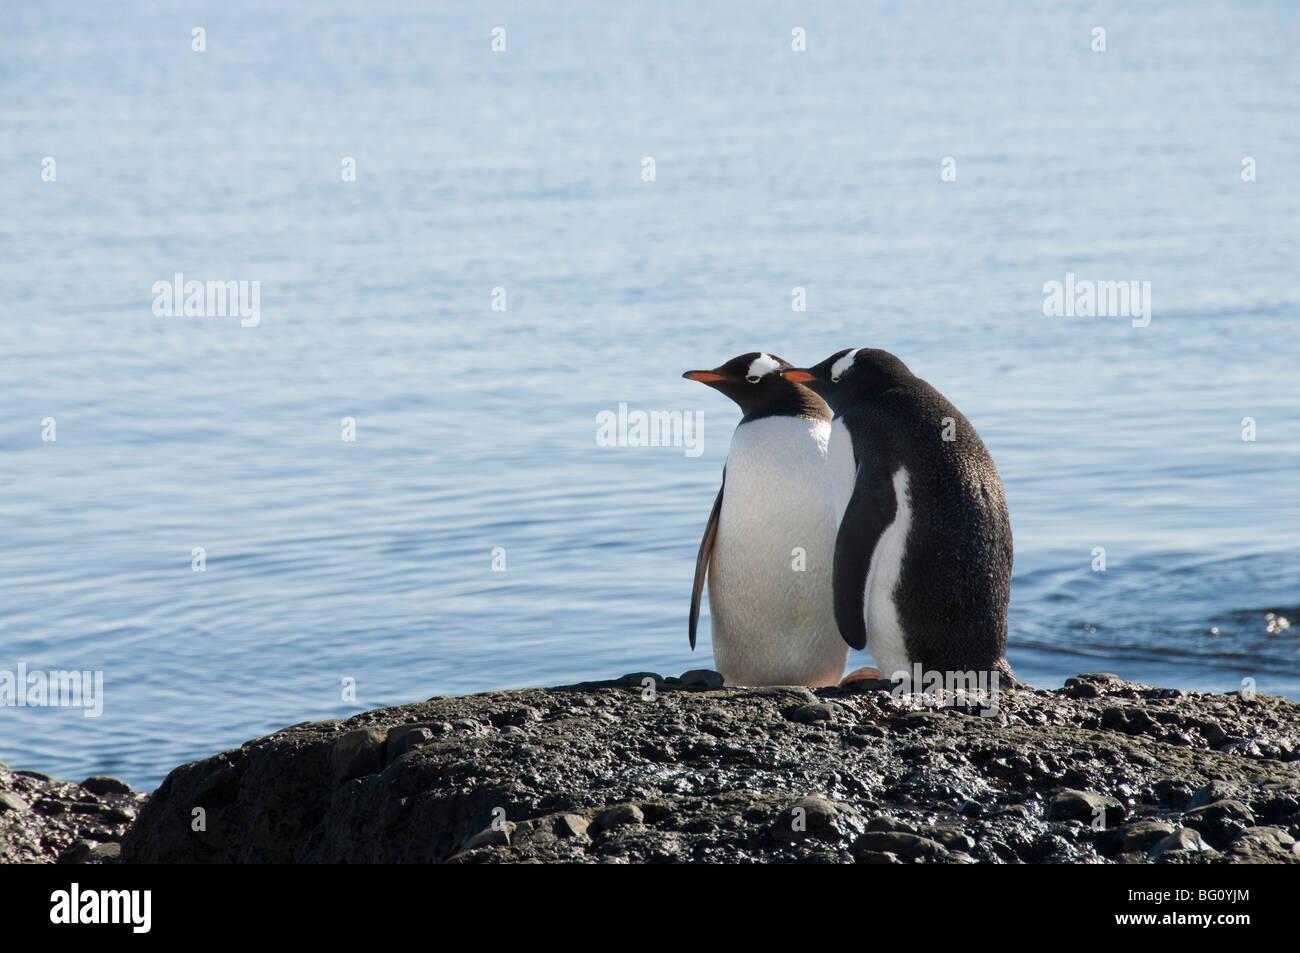 Gentoo penguins at Brown Bluff, Antarctic Peninsula, Antarctica, Polar Regions - Stock Image